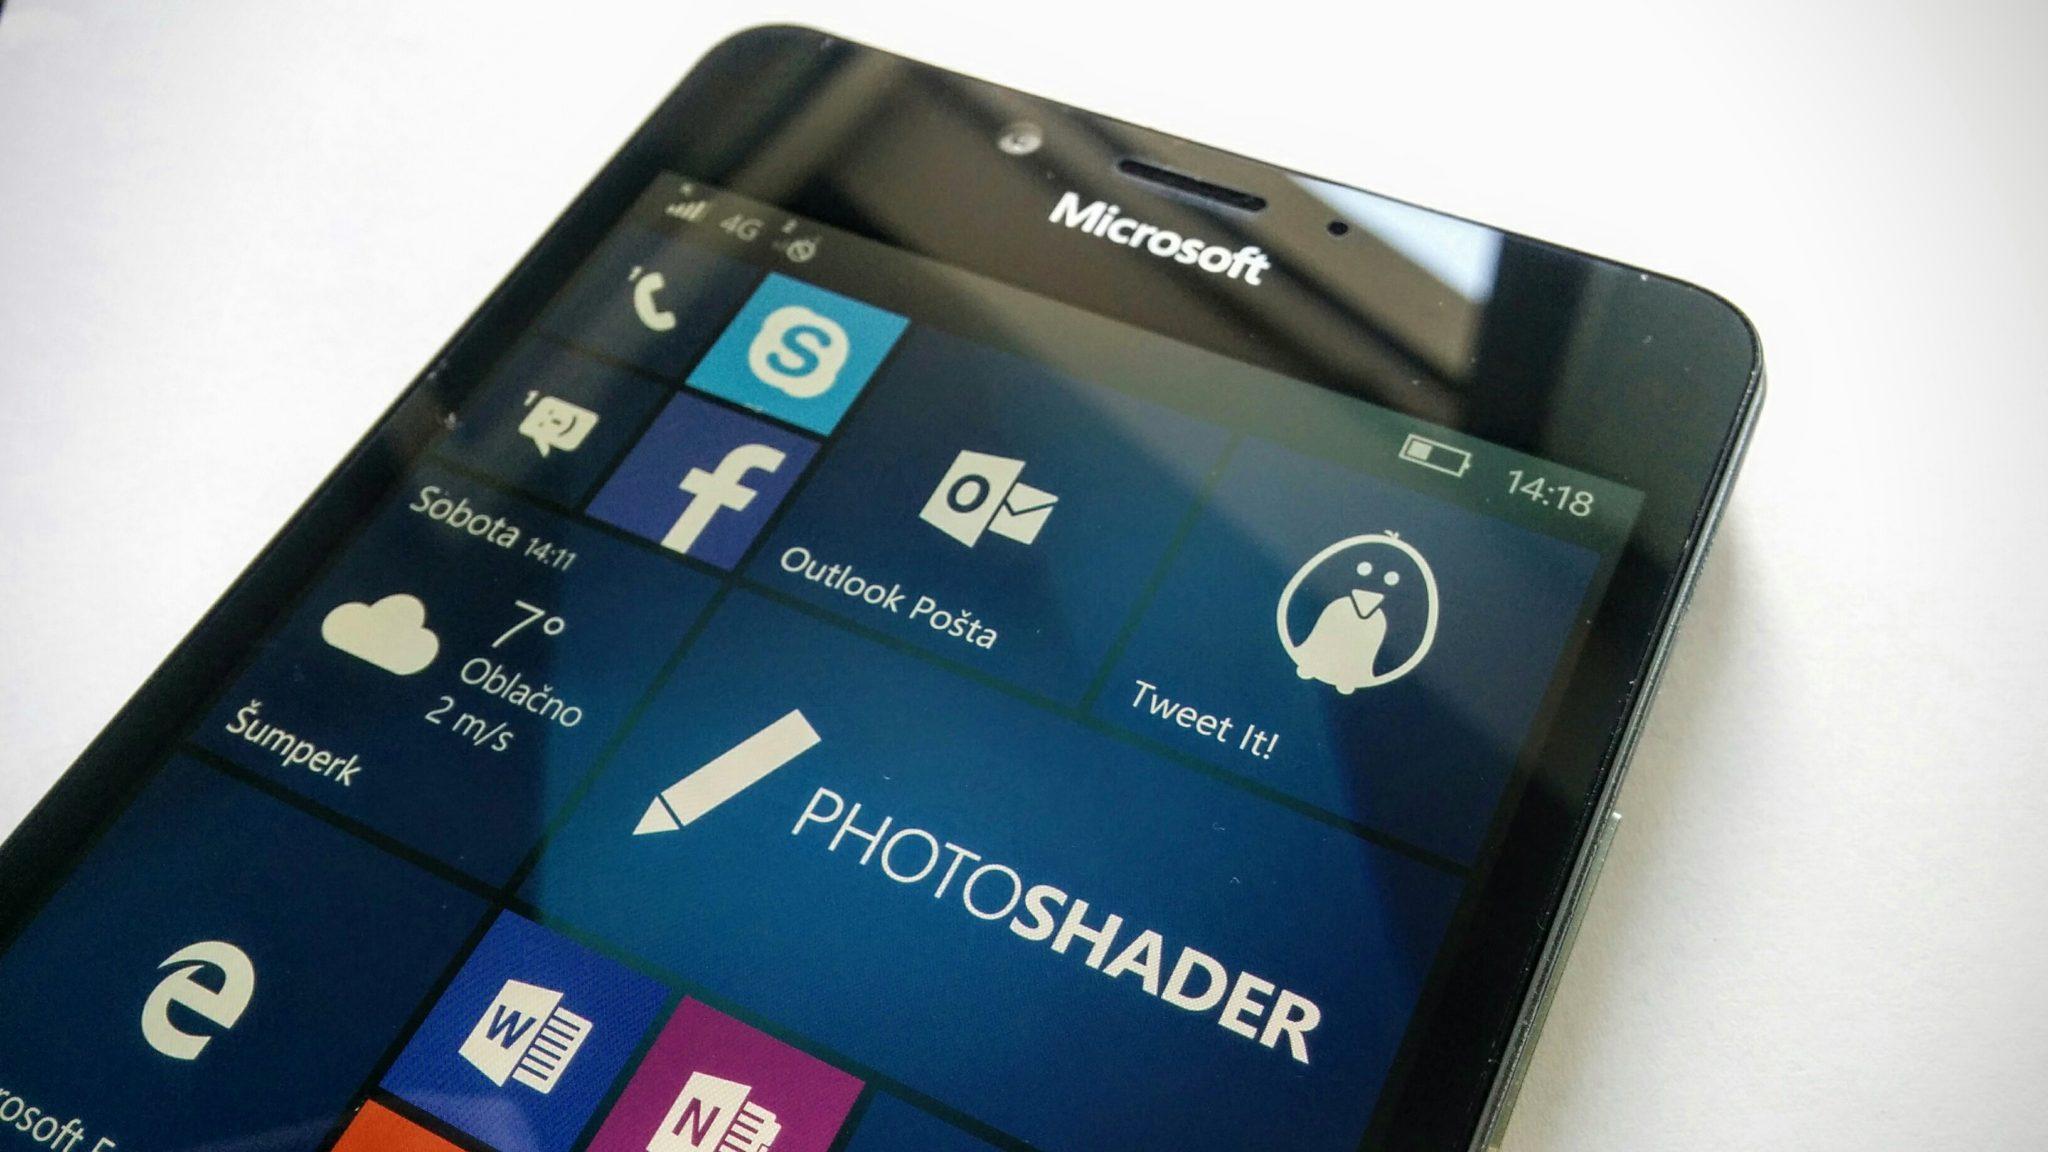 Facebook ruší Messenger, Instagram a svou aplikaci pro Windows Mobile